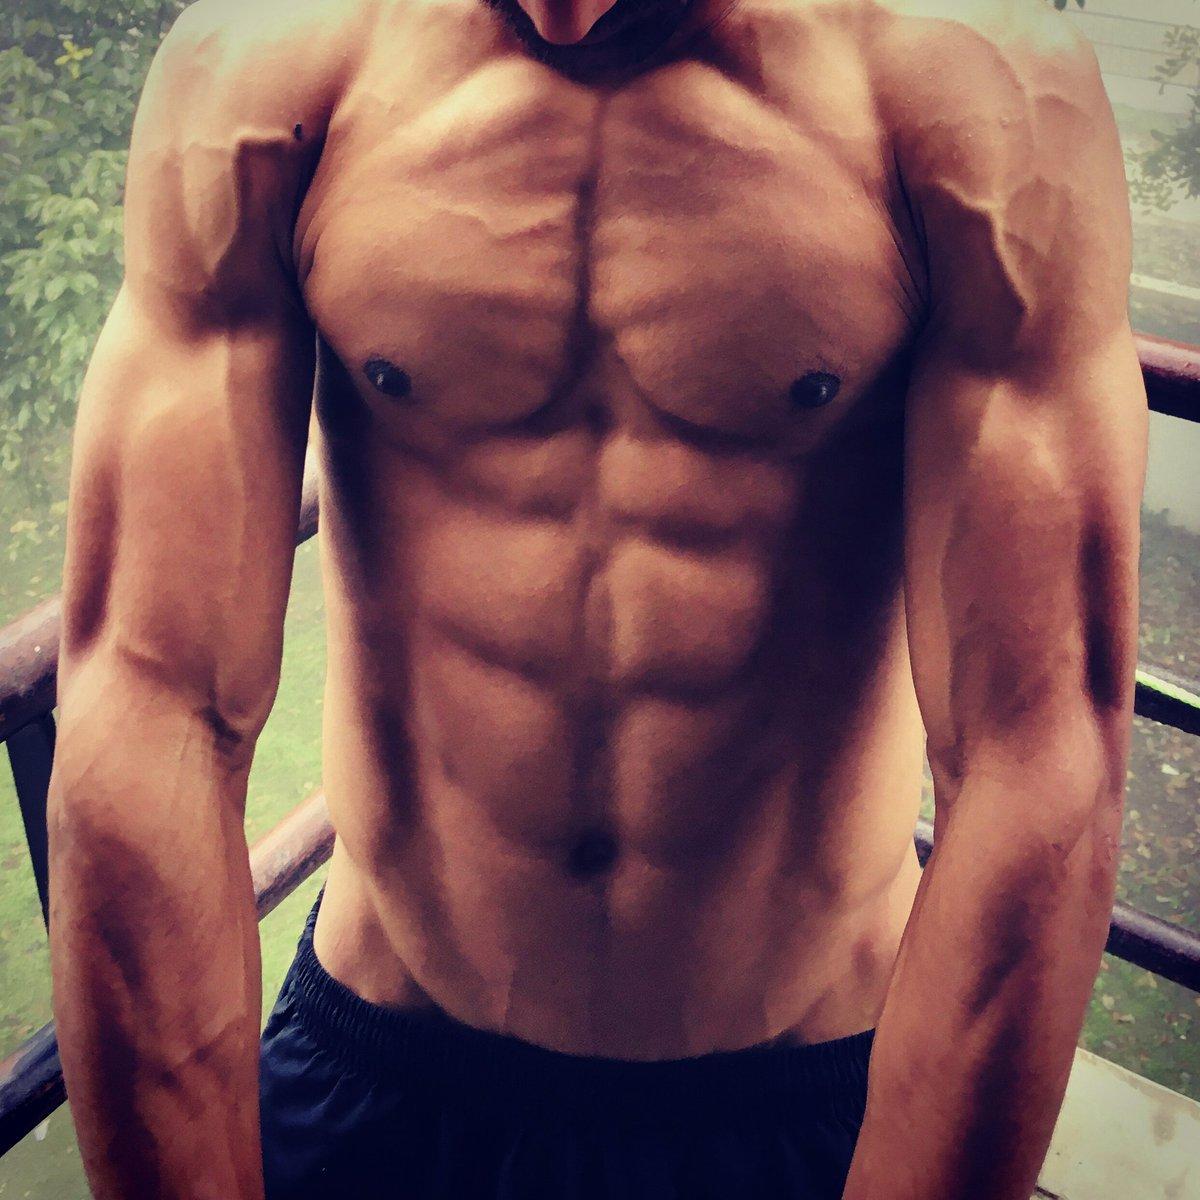 #beastmode  #on   #yogathenic  #calisthenics  #yoga   #health  #body   #fitnessmodel  #fitnessinfluencer  #fitness    #india   #6pack   #abs  #core  #nutrition  #shredded  #vegetarian  #fitnessfreak   https://www.instagram.com/p/B8IUh_aFCeV/?igshid=1obmflzq5f83p  …